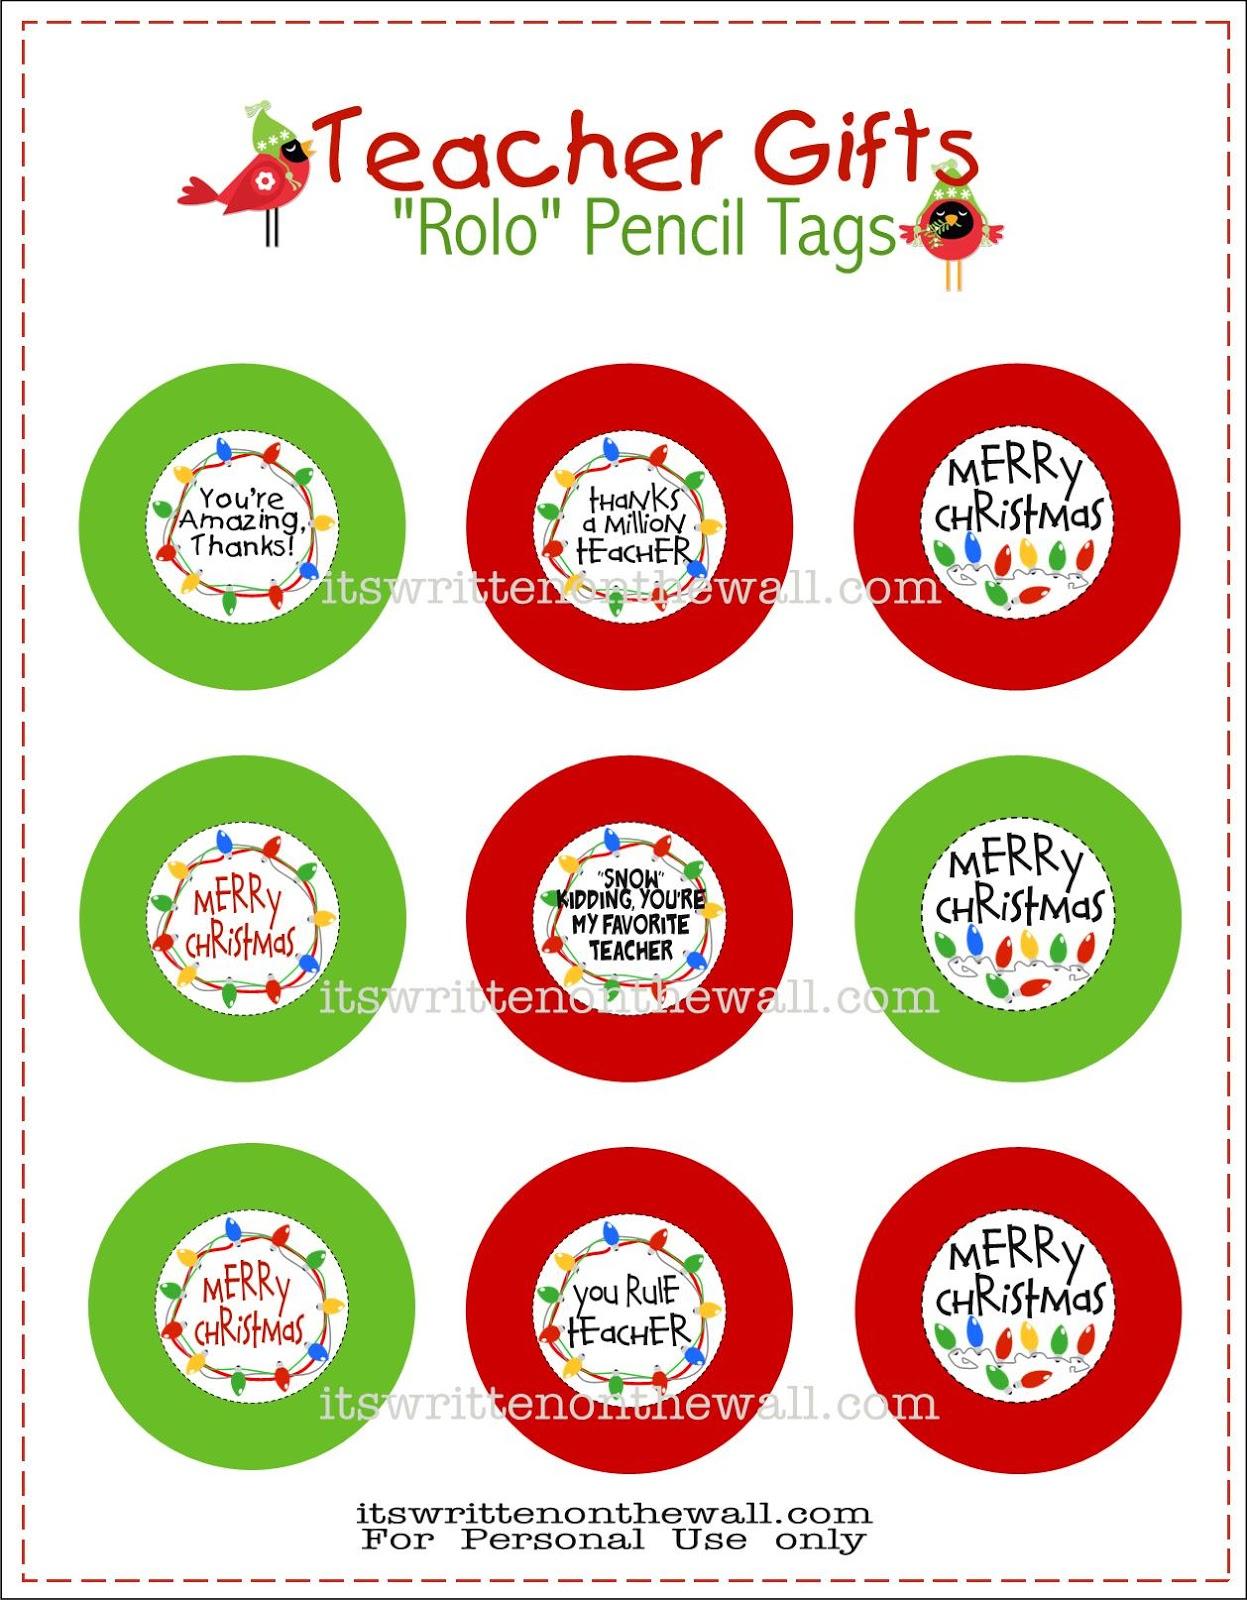 Freebie) Teacher Christmas Gift-Rolo Pencils w/Tags | Pinnutty.com